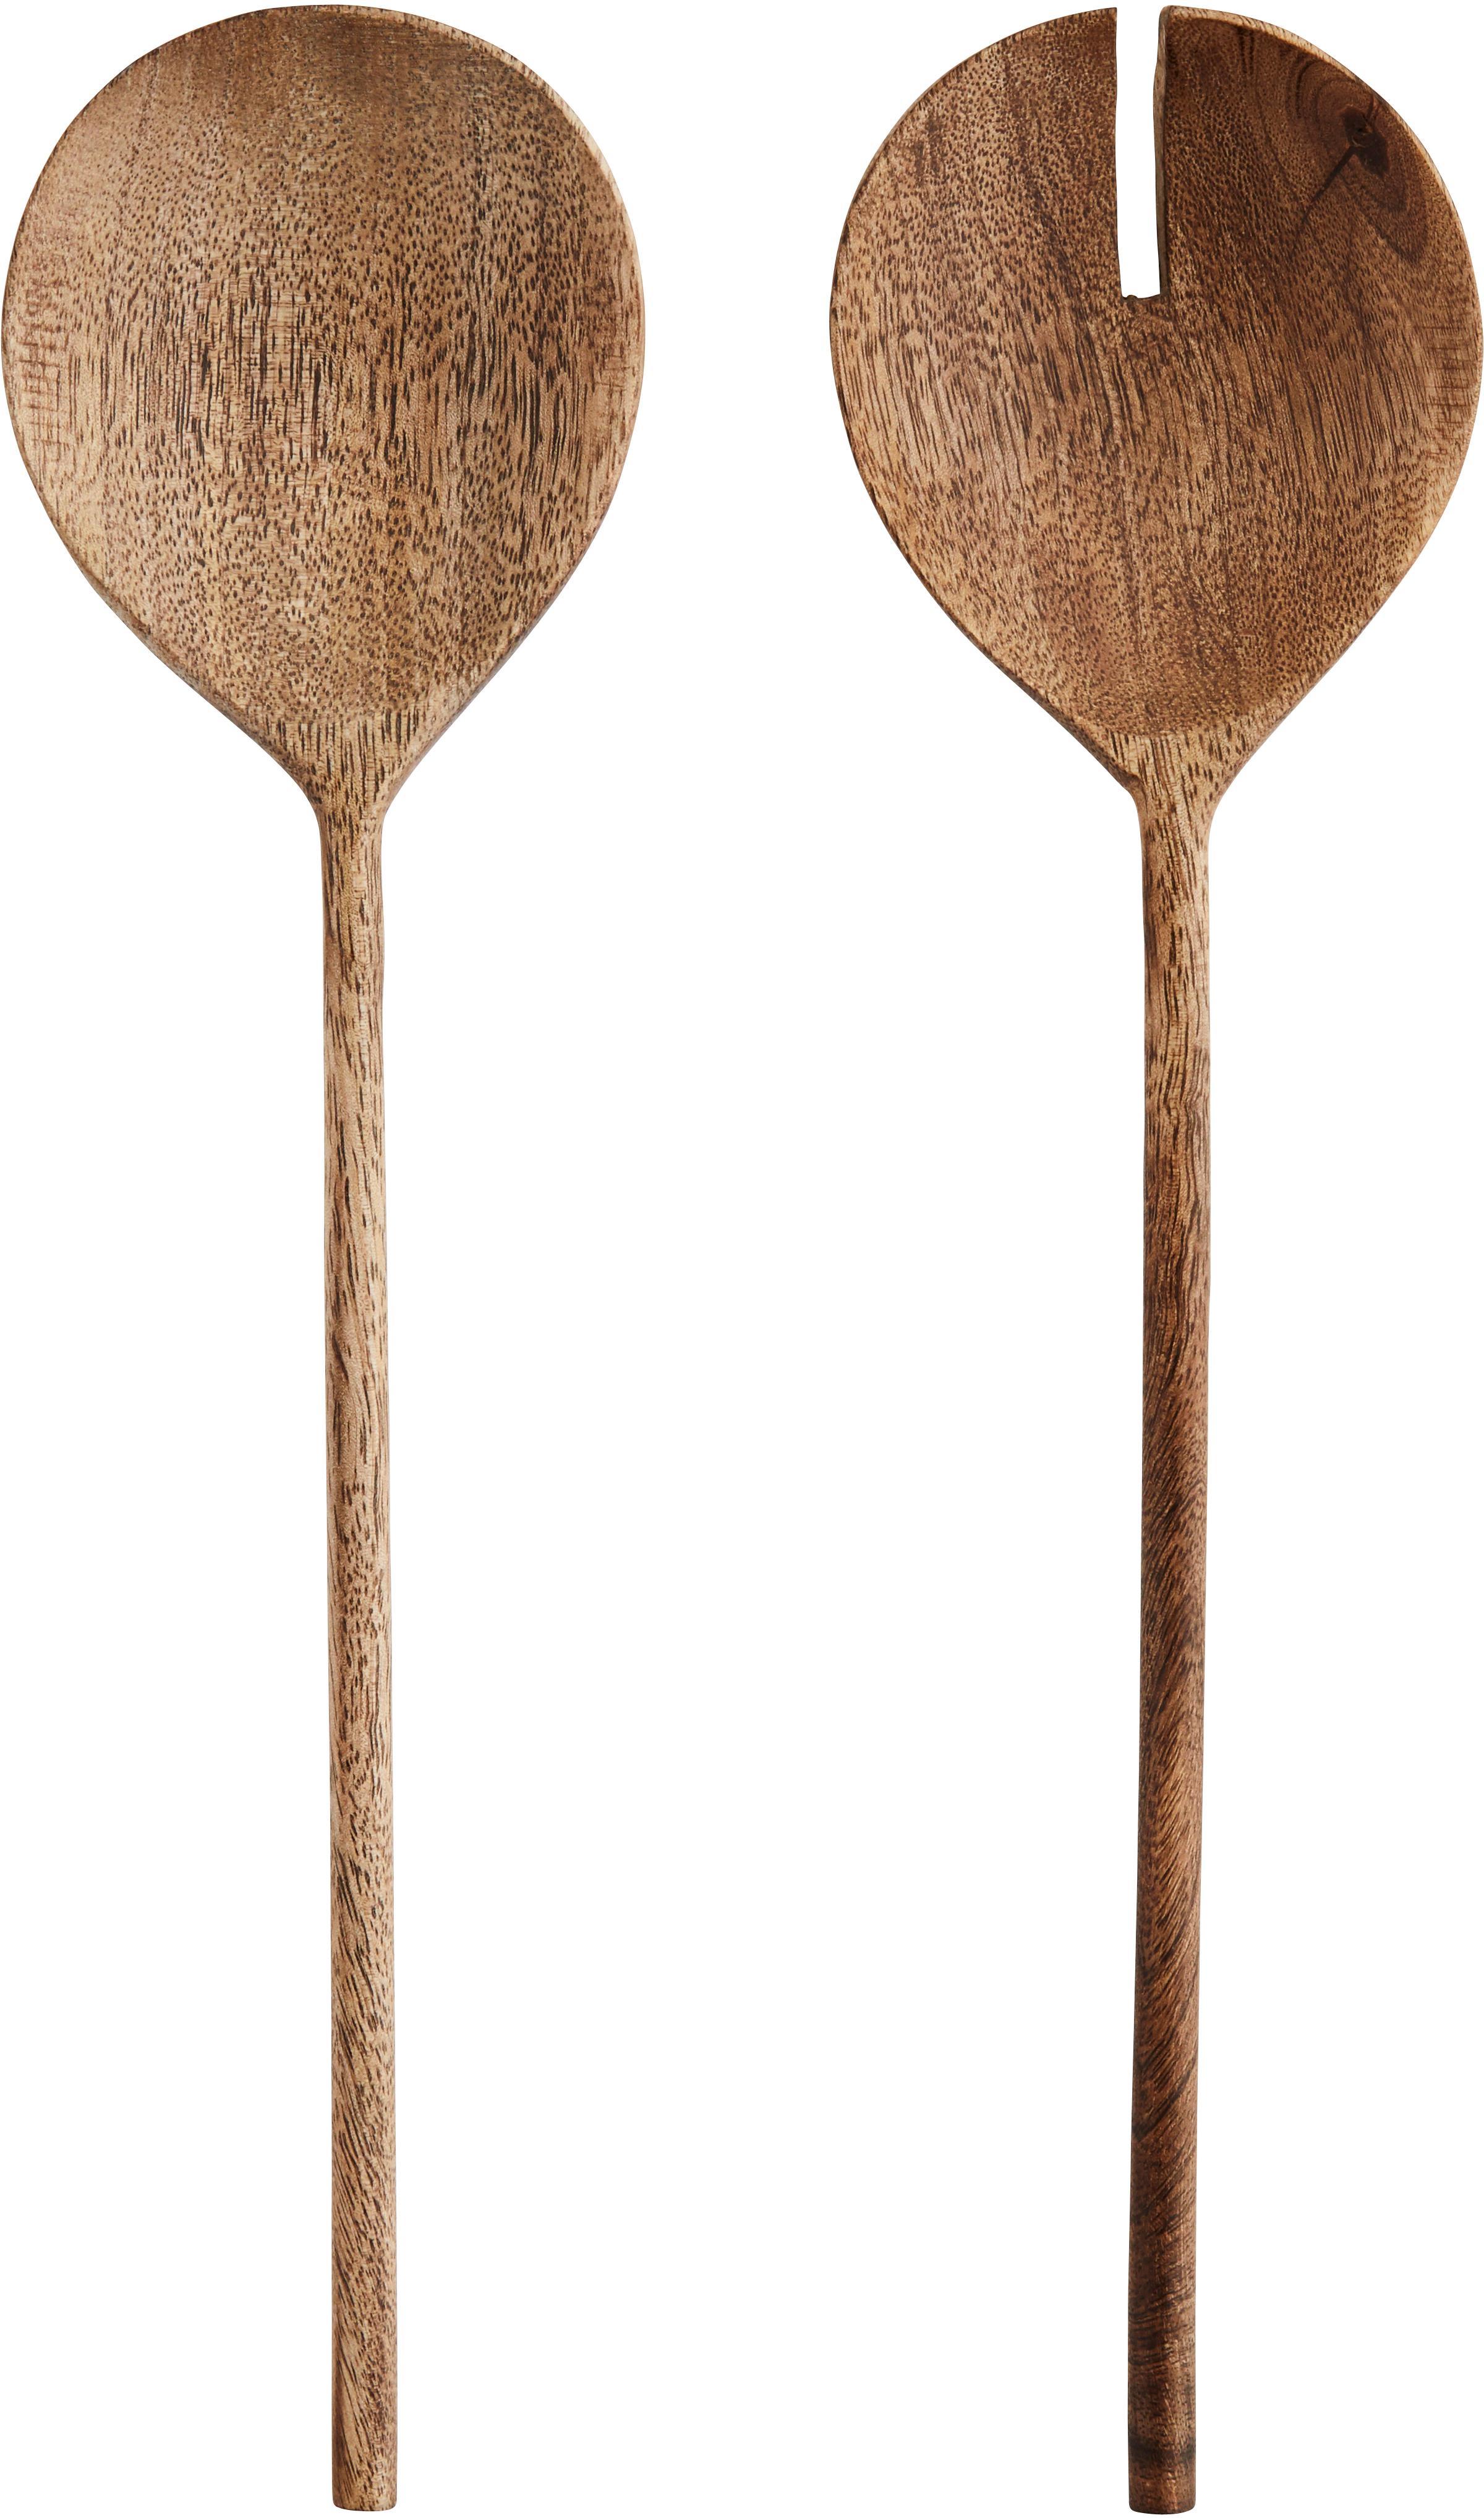 Komplet sztućców do sałatek Wodeen, 2 elem., Drewno mangowe, Drewno mangowe, D 28